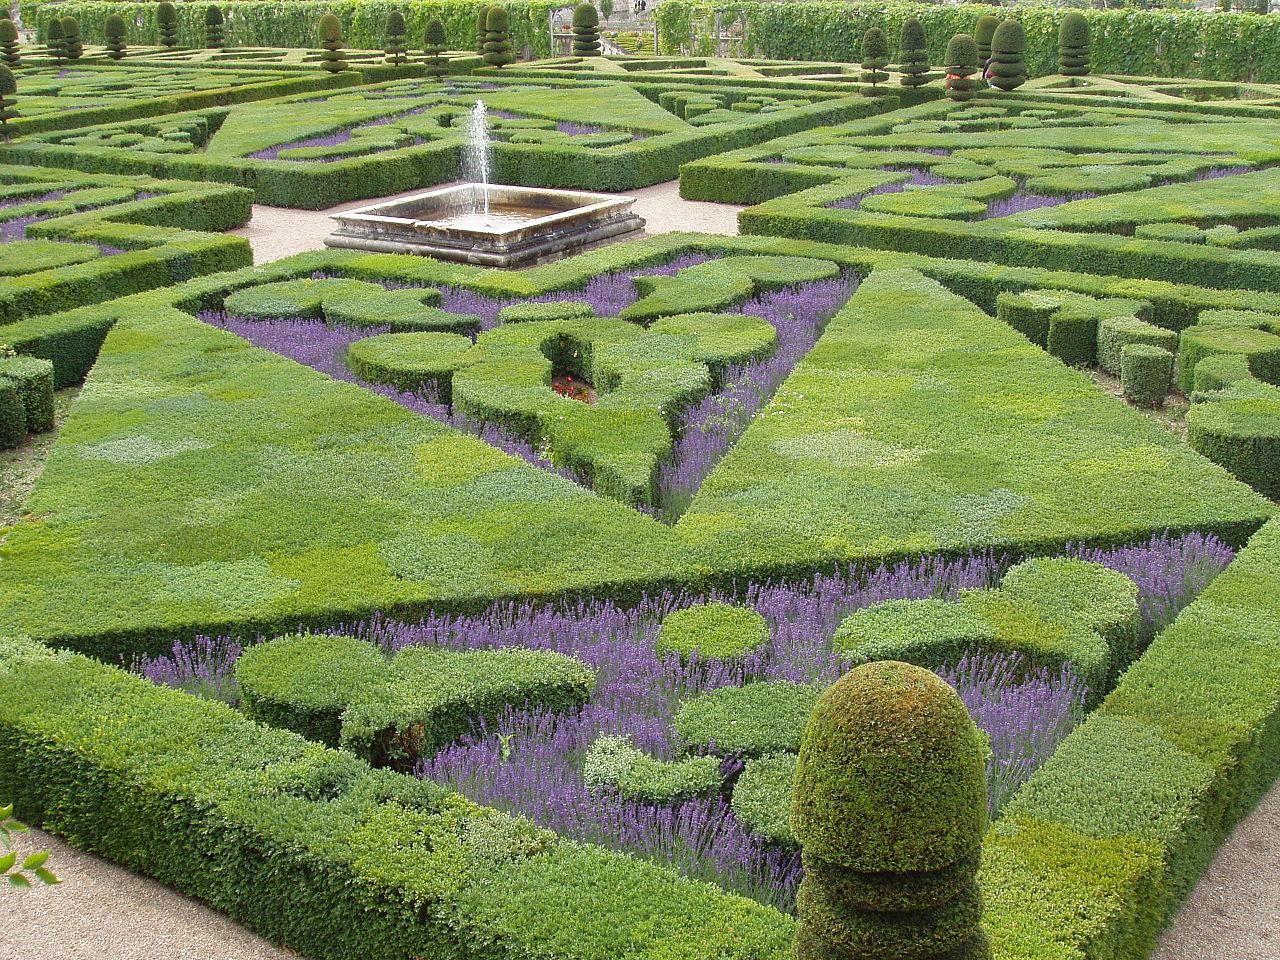 Chateau Villandry garden, Loire Valley, 2004